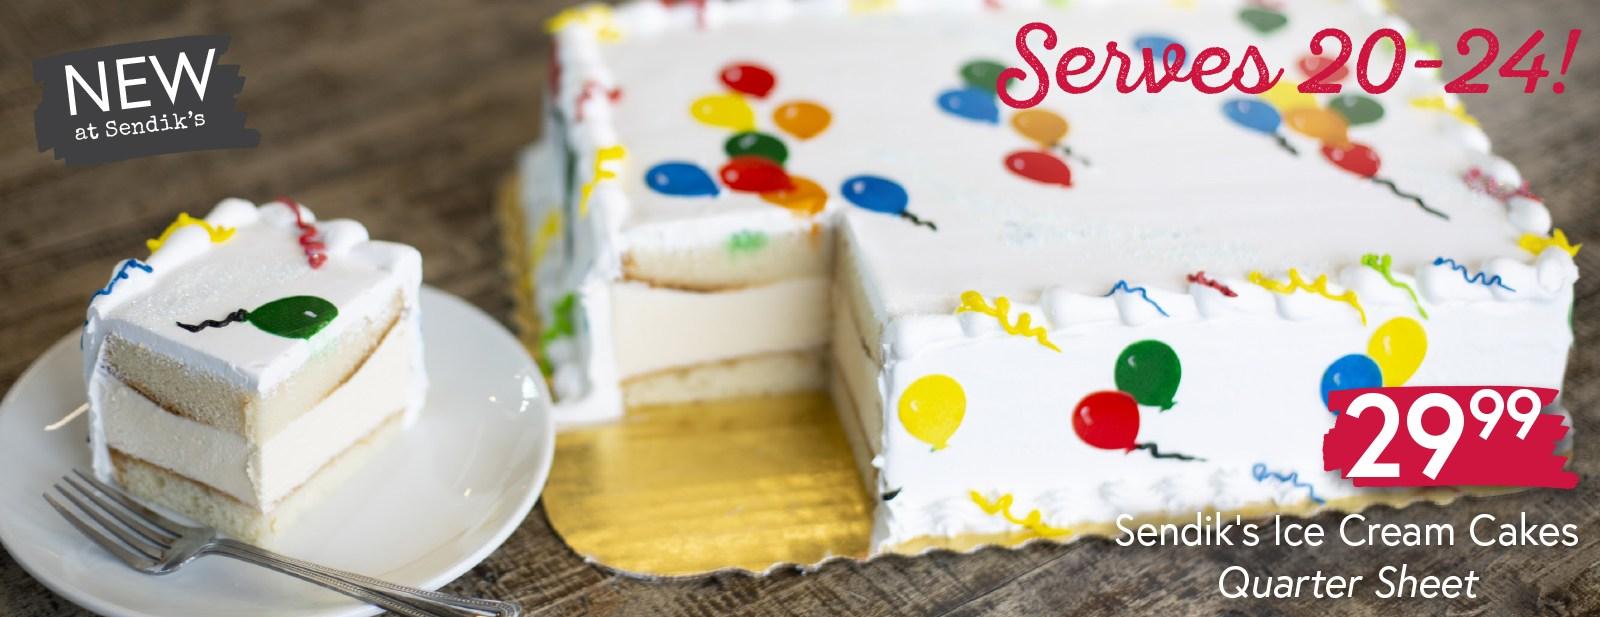 Sendik's Ice Cream Cakes Quarter Sheet $29.99